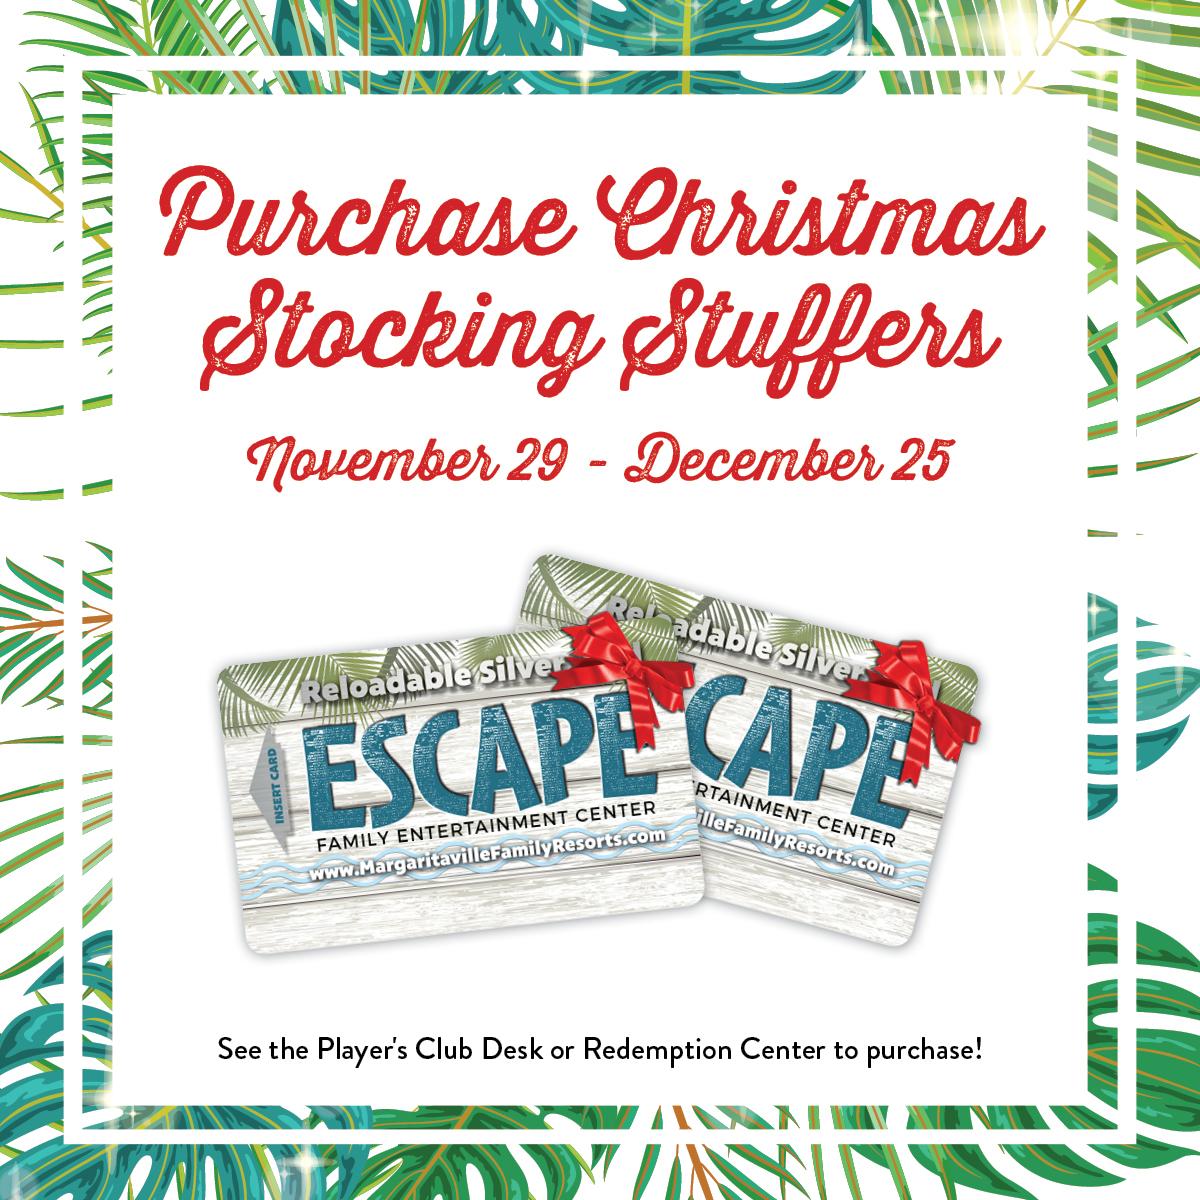 Christmas Shopping Specials in Vicksburg